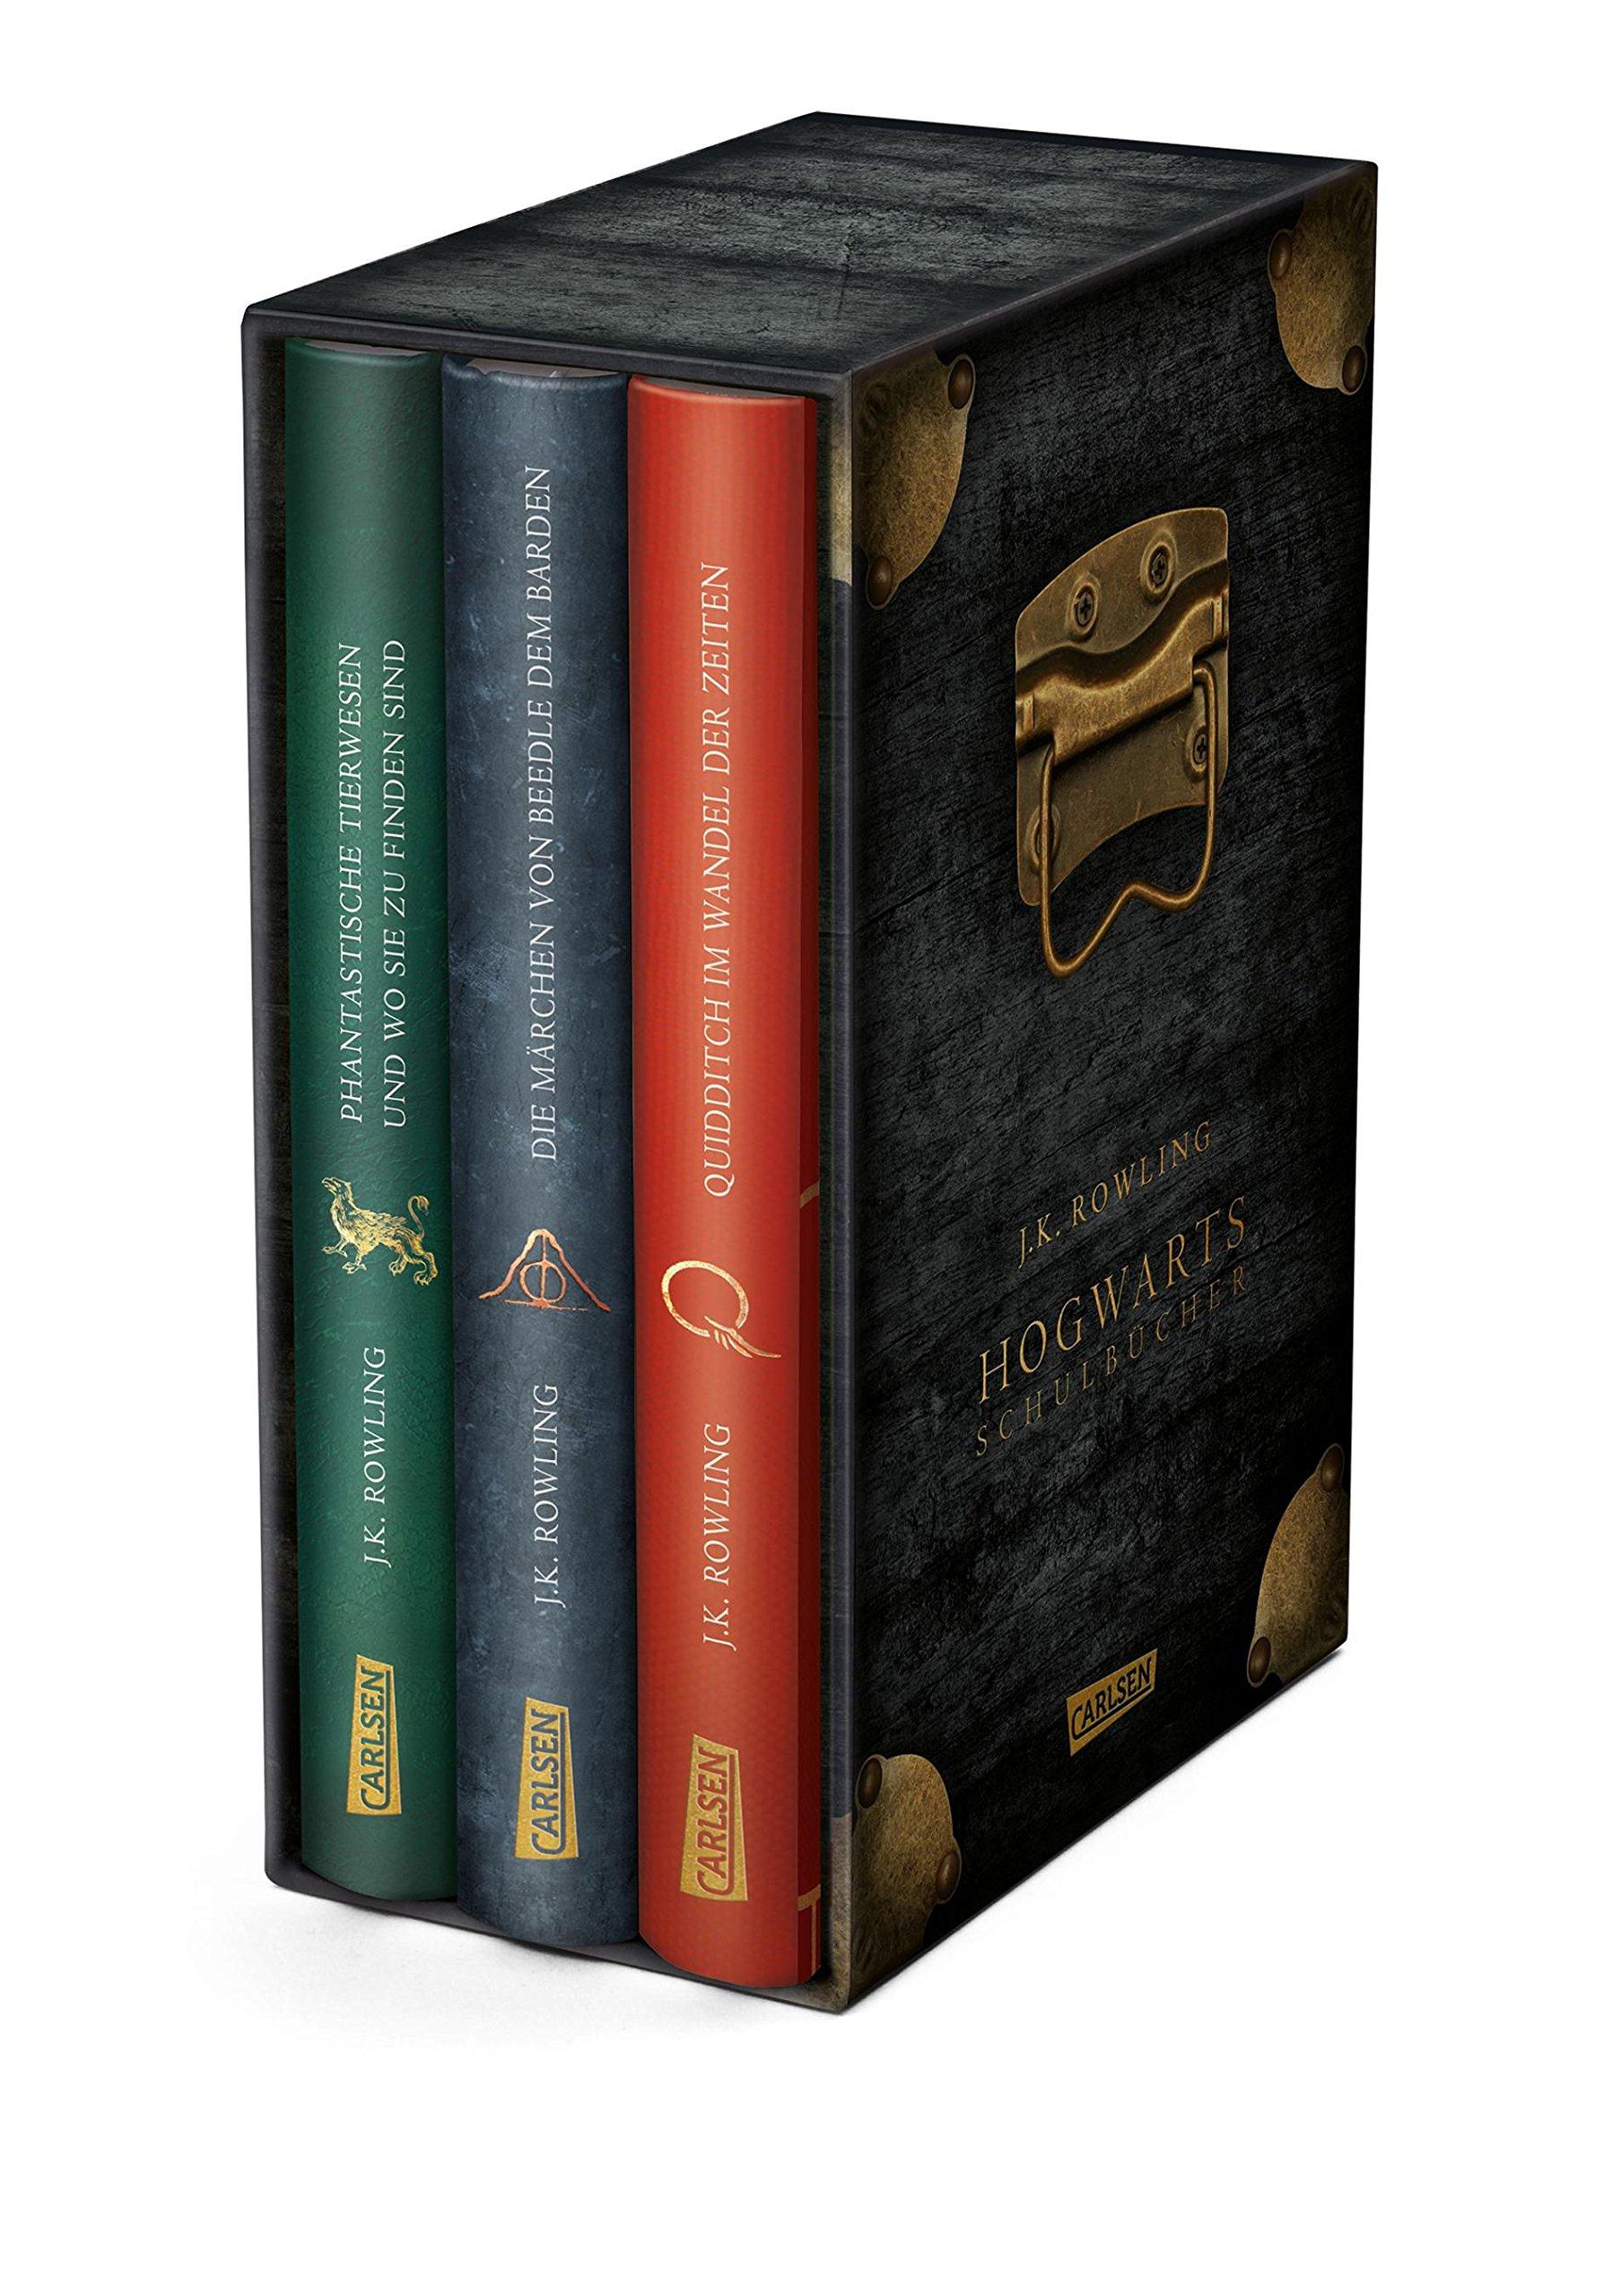 Hogwarts-Schulbücher: Die Hogwarts-Schulbücher im Schuber Gebundenes Buch – 28. September 2018 J.K. Rowling Klaus Fritz Carlsen 355155708X